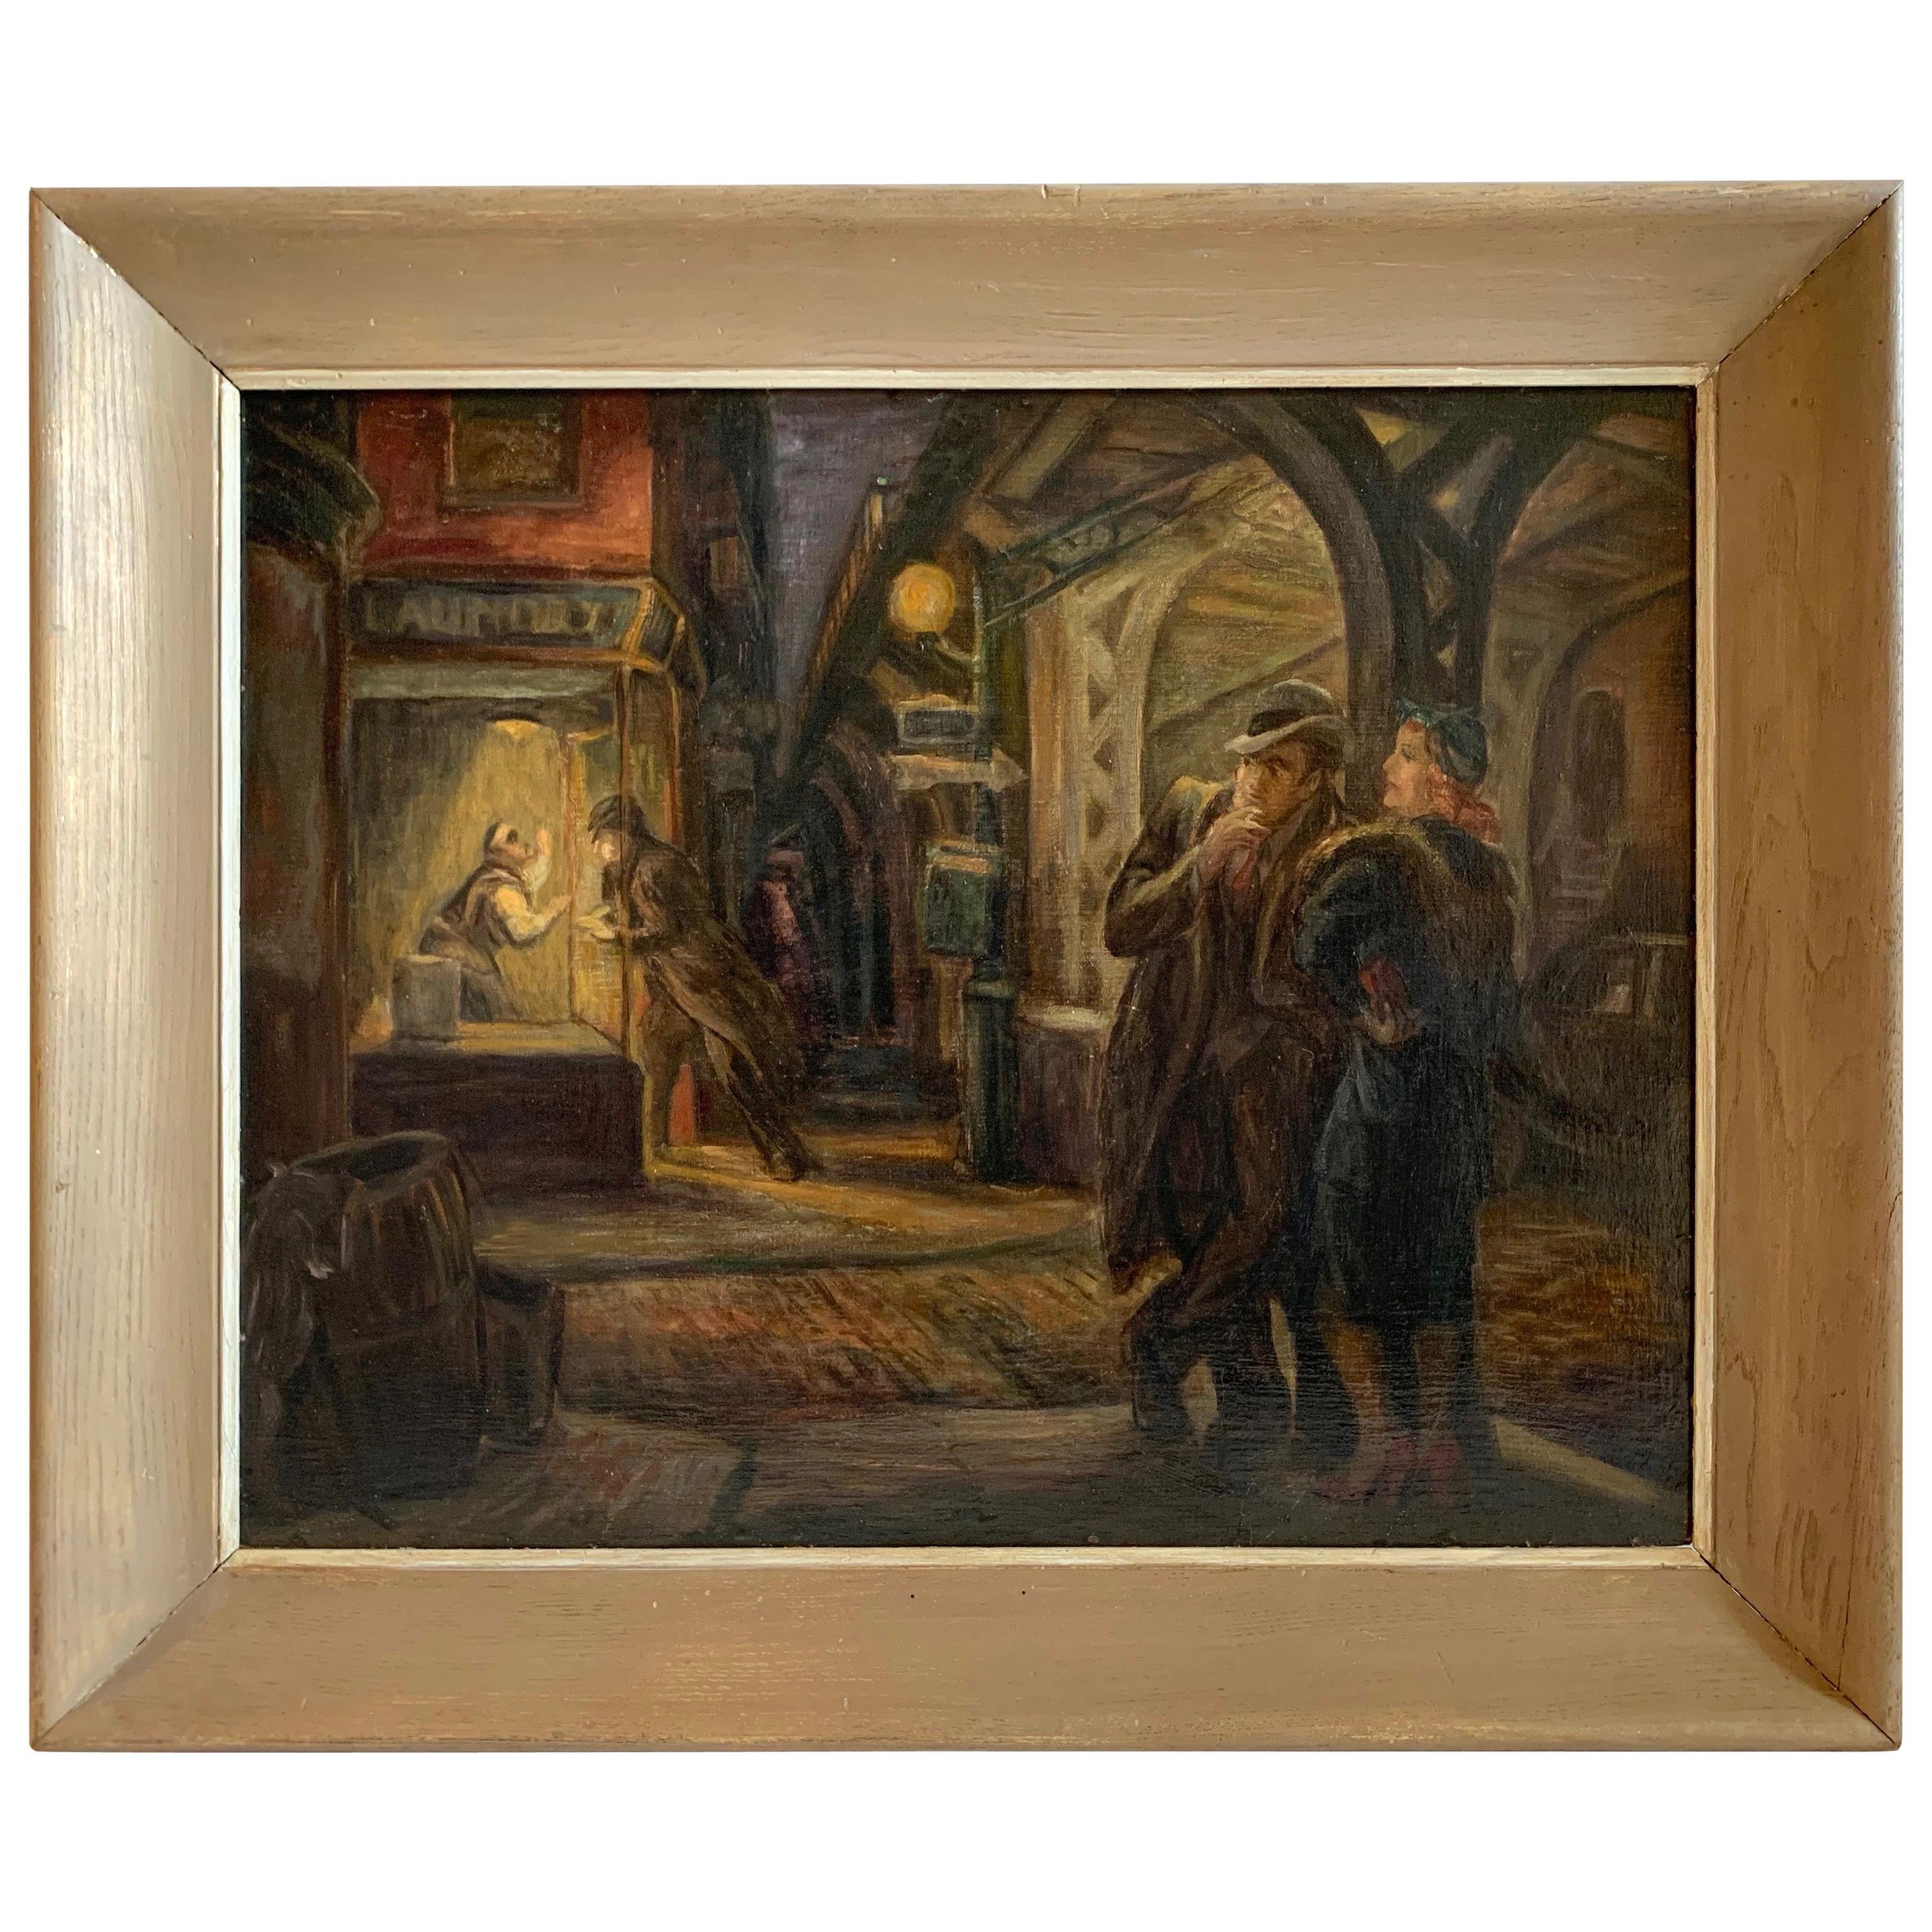 Don Freeman 'Under The El' American Realist Oil Painting